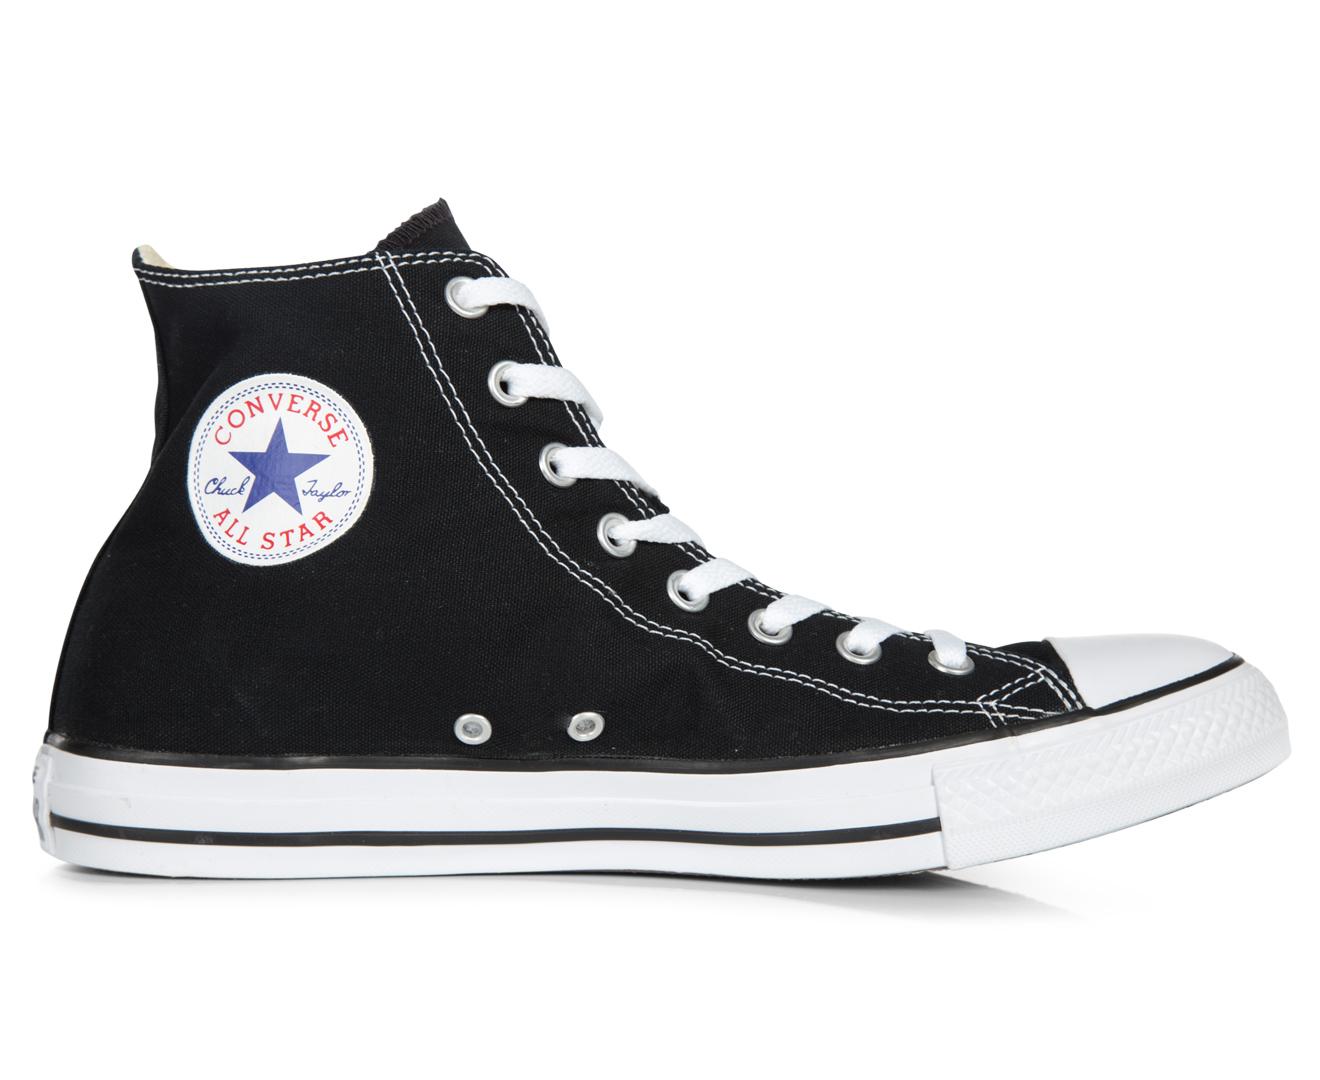 48a057d2040 Converse Chuck Taylor Unisex All Star High Top Shoe - Black